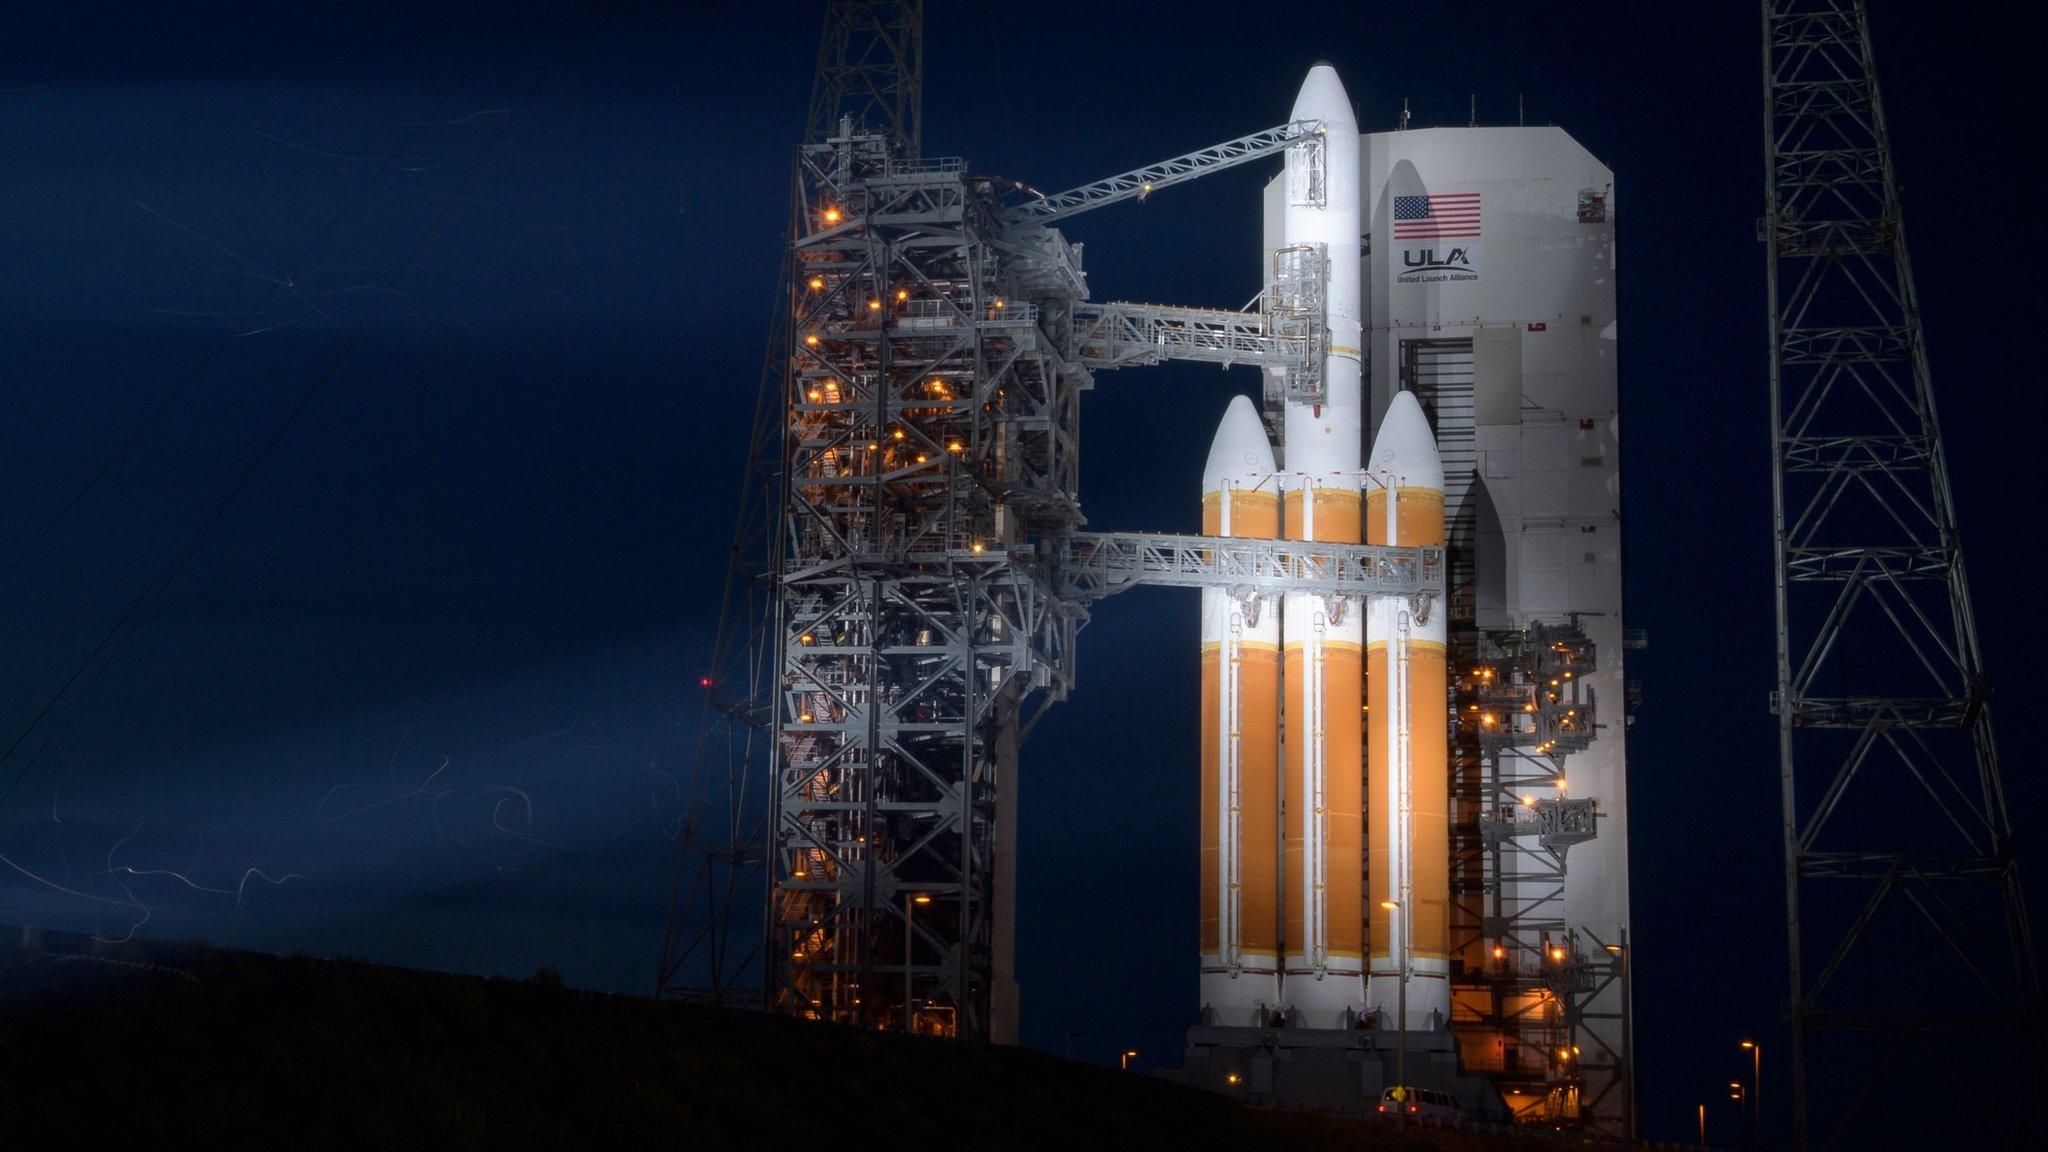 Parker Solar Probe: Nasa delays mission to unlock Sun's mysteries